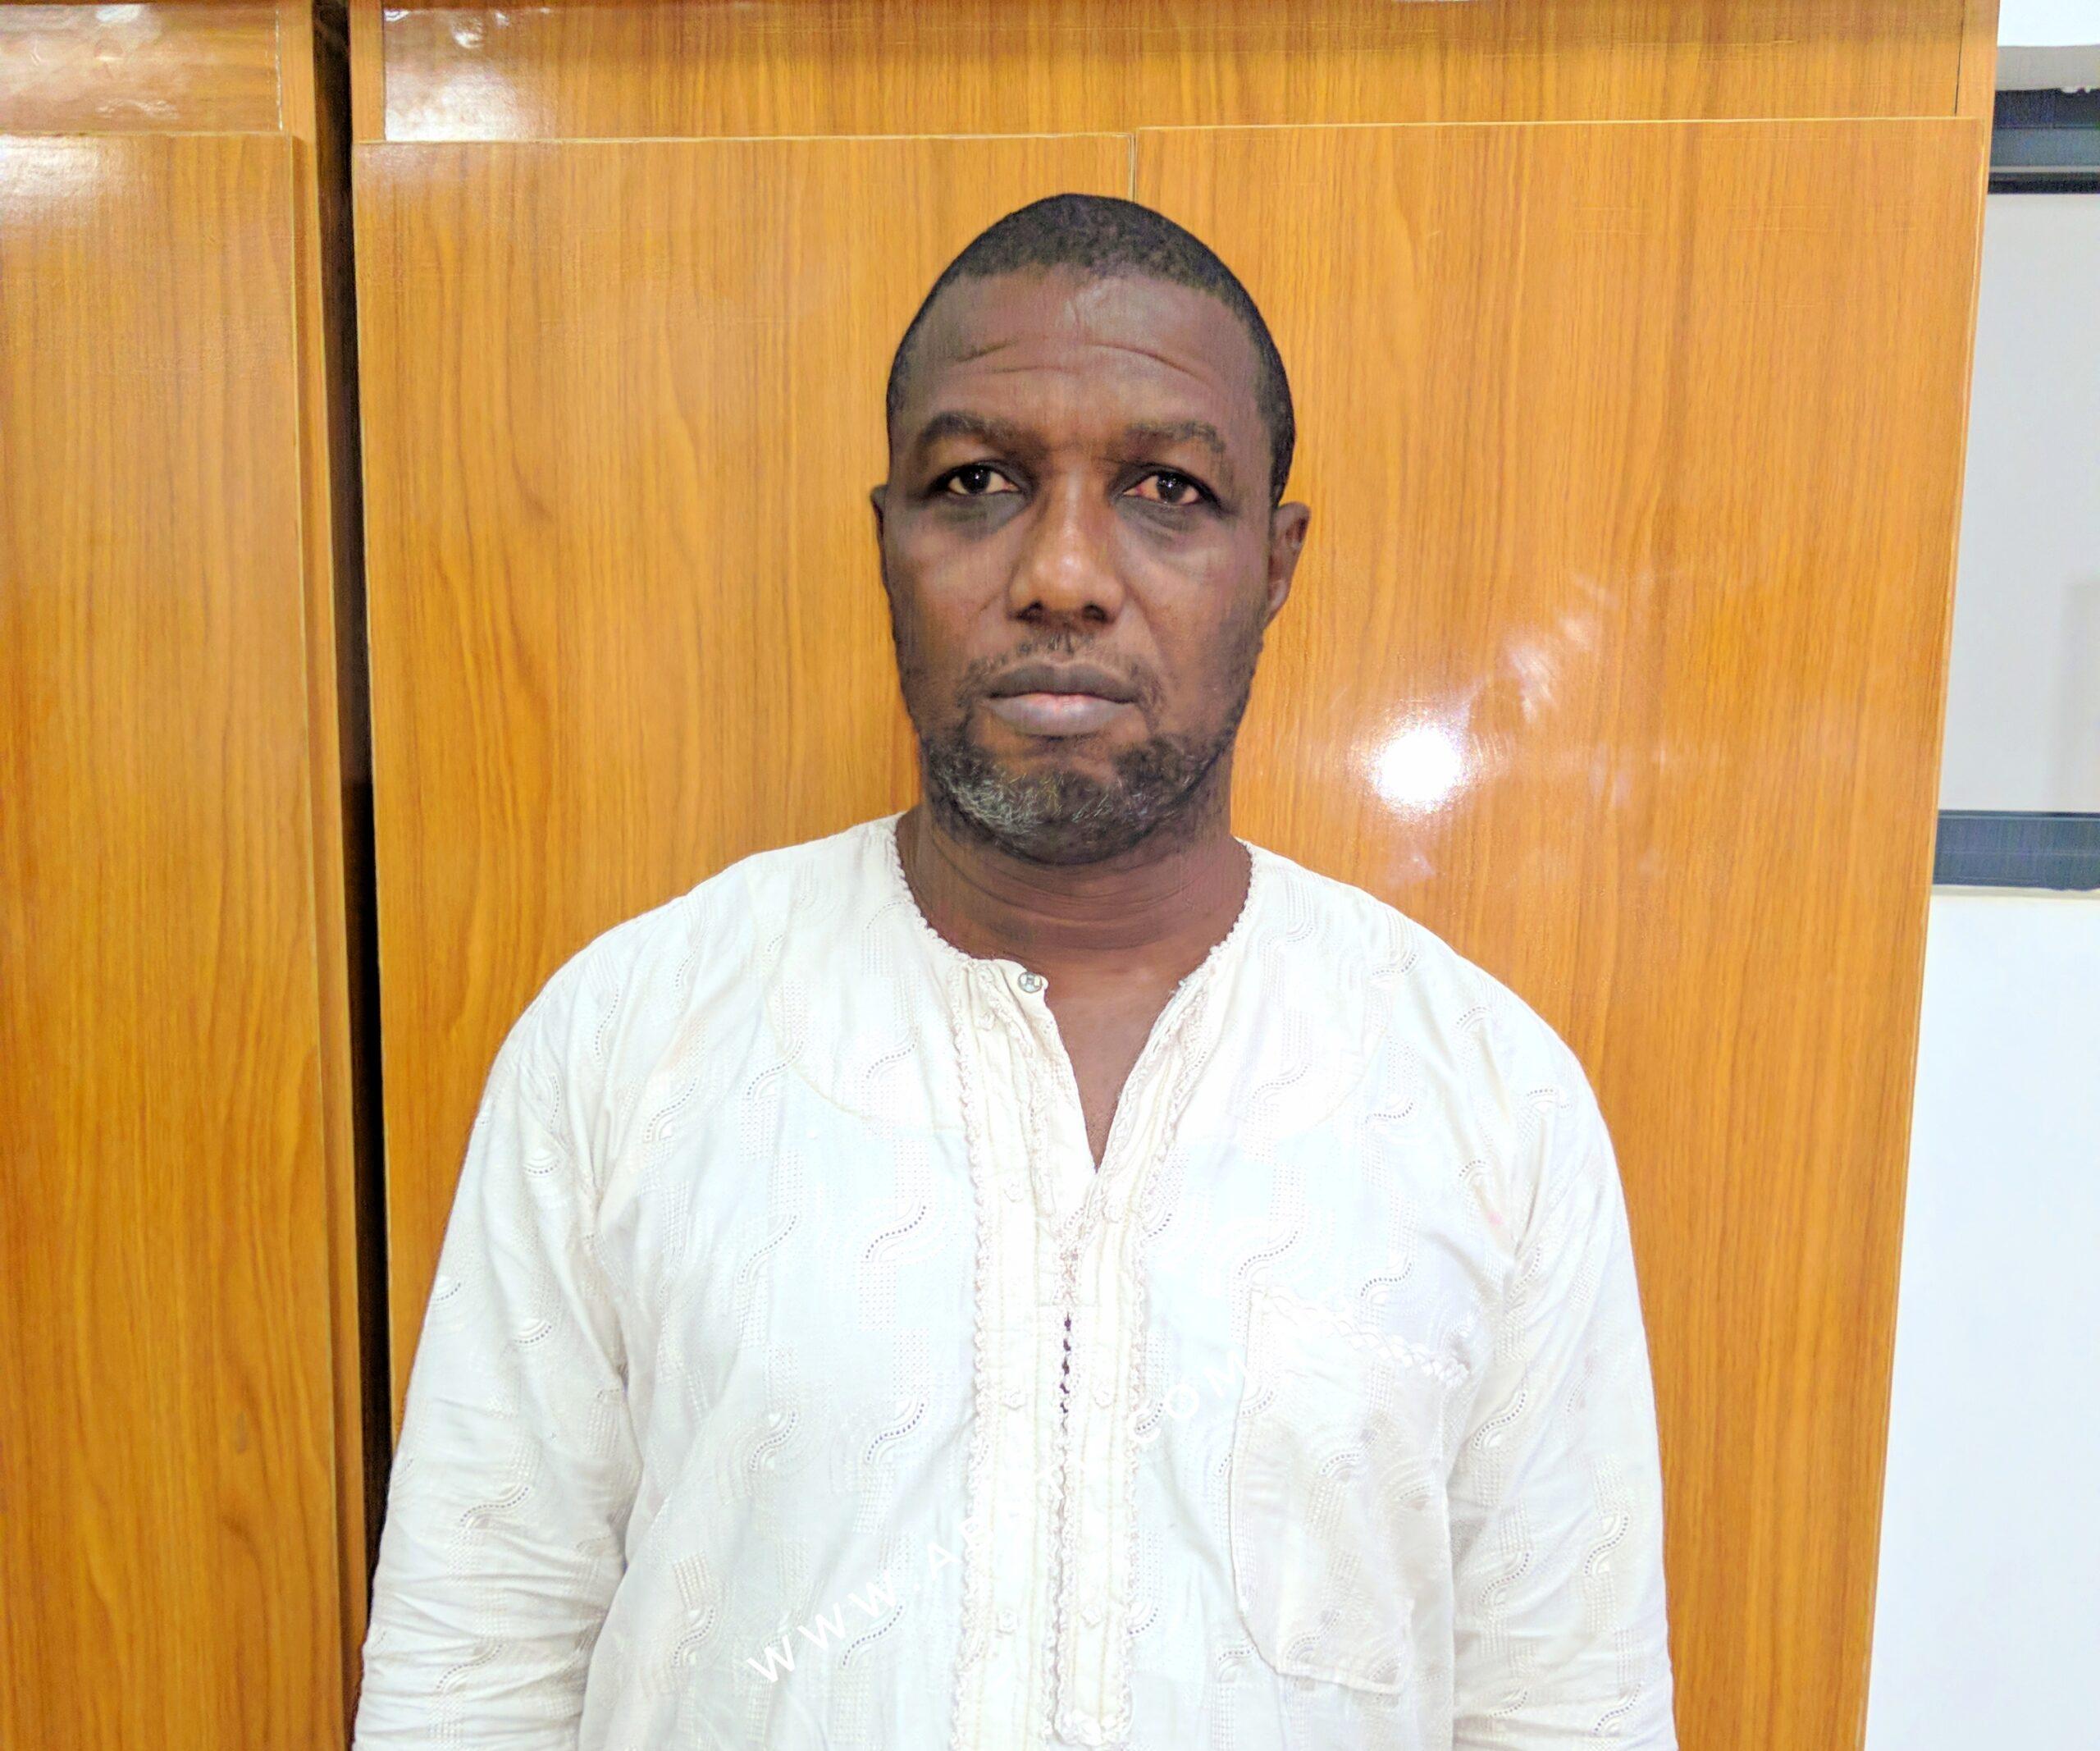 EFCC Arrests Juju Scam Kingpin, Abayomi Alaka over N250m Fraud [PHOTOS]